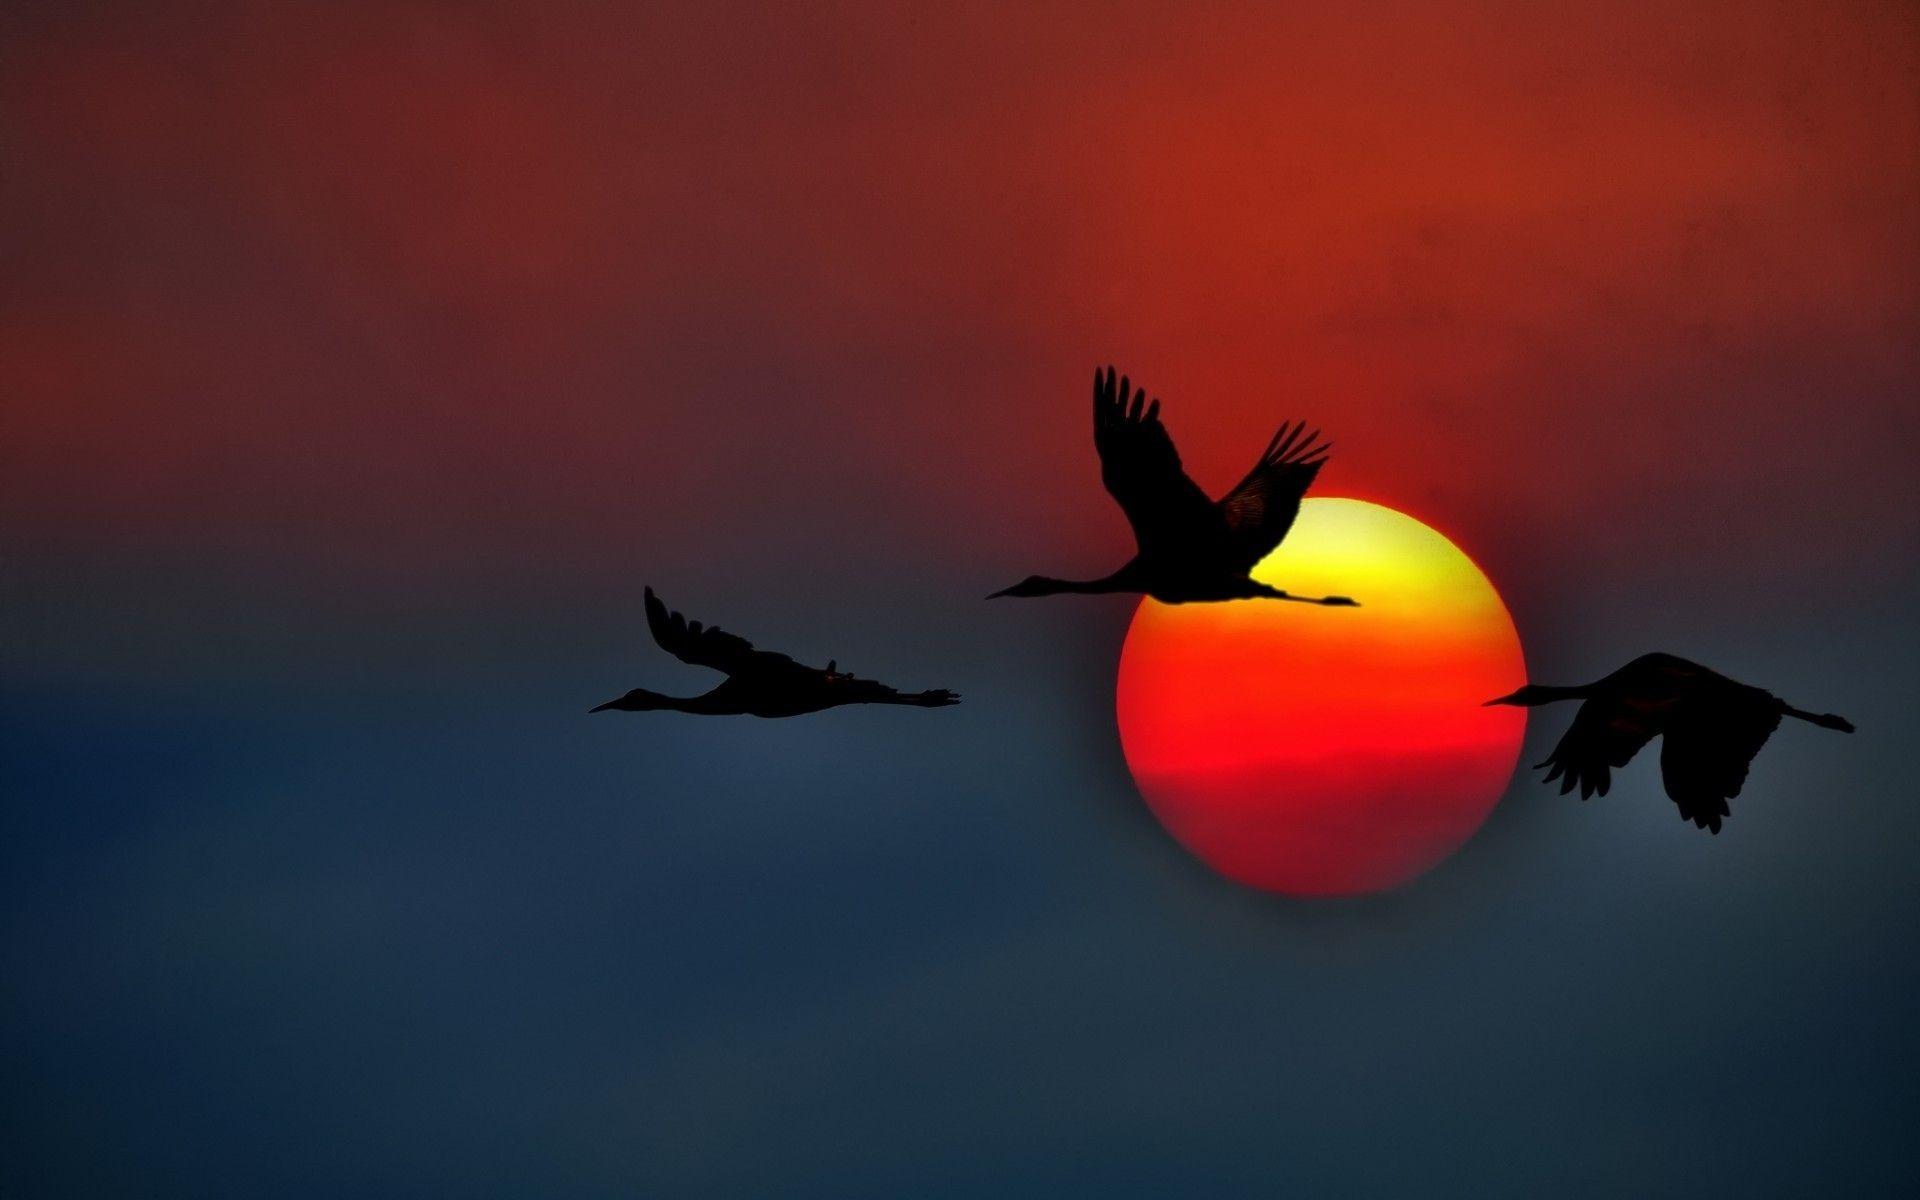 Pin By Lopusina Marijana On Nature With Images Crane Bird Birds Flying Bird Wallpaper